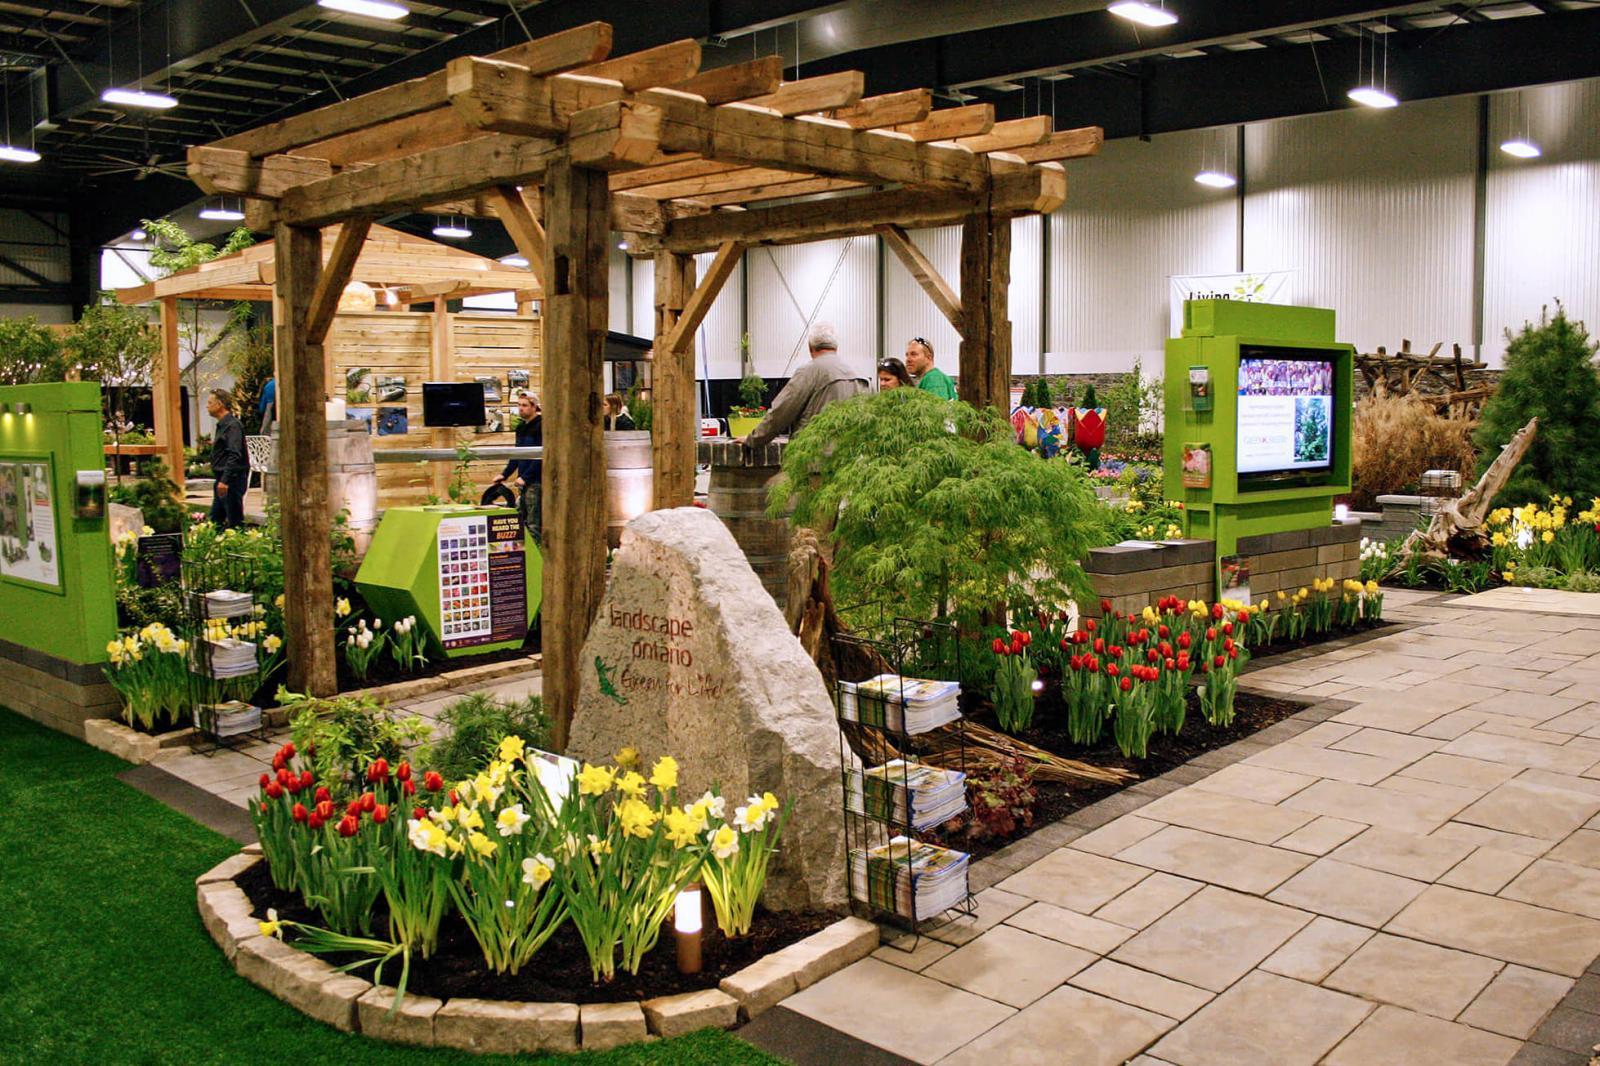 Landscape Ontario feature garden.